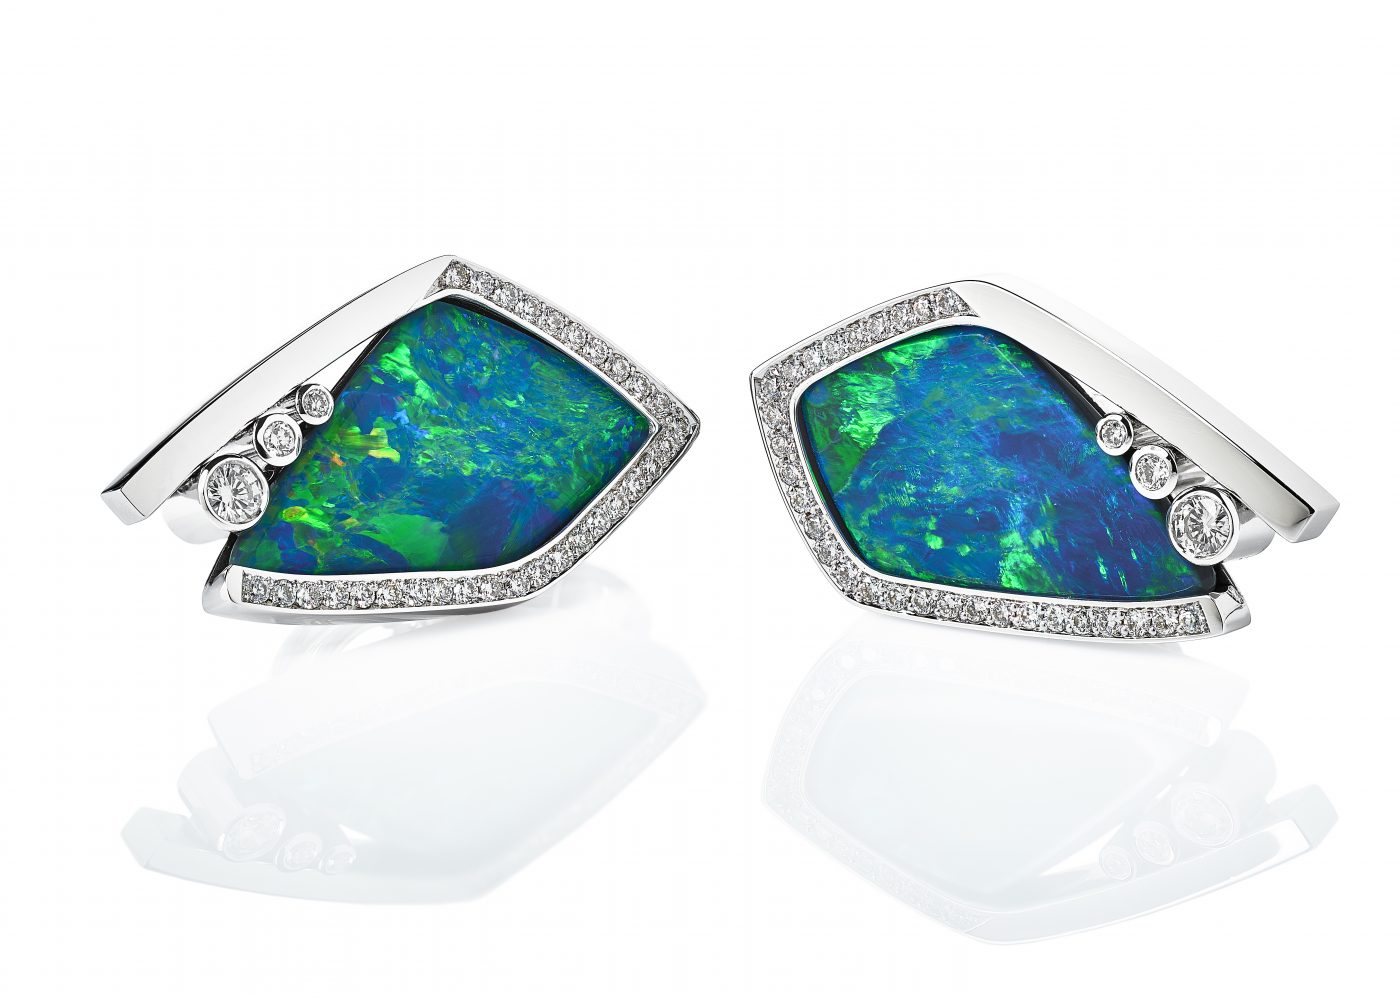 Schwarzer opal preis